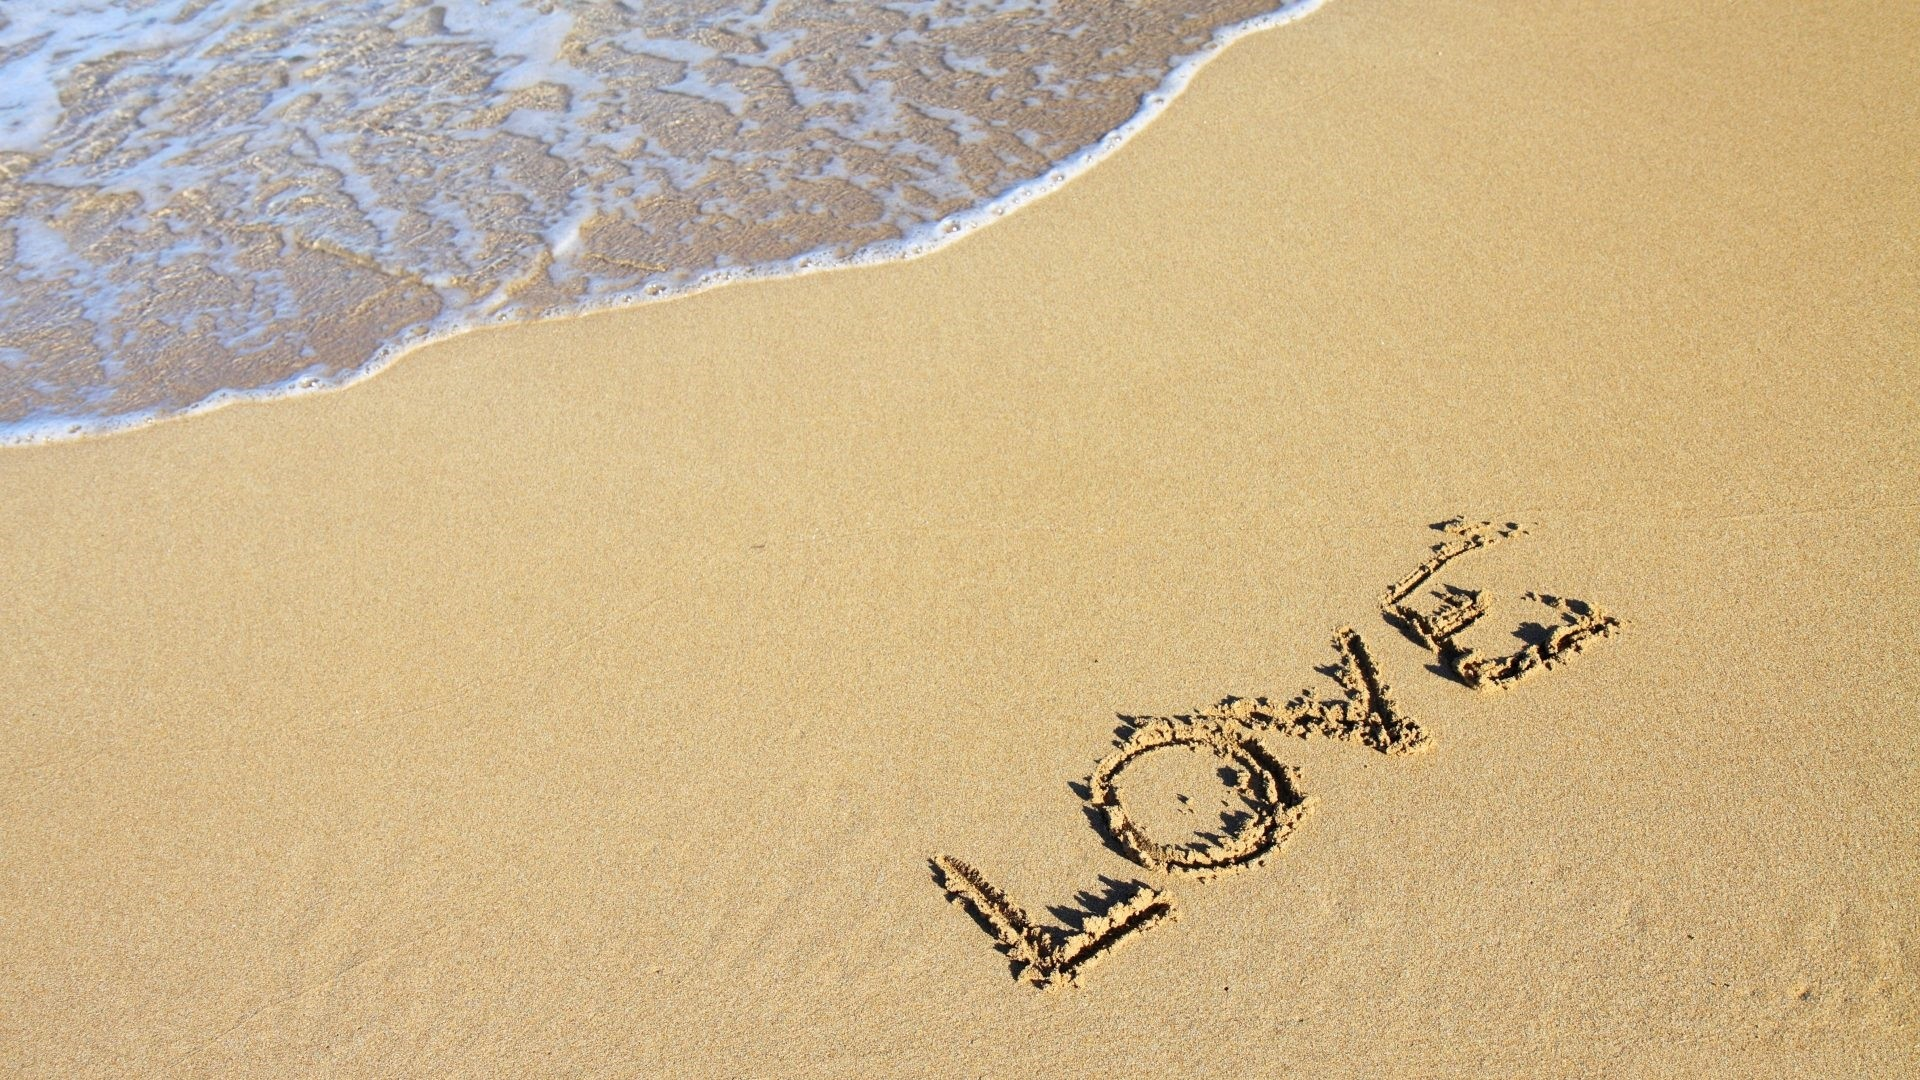 Sand Love Wallpaper theme